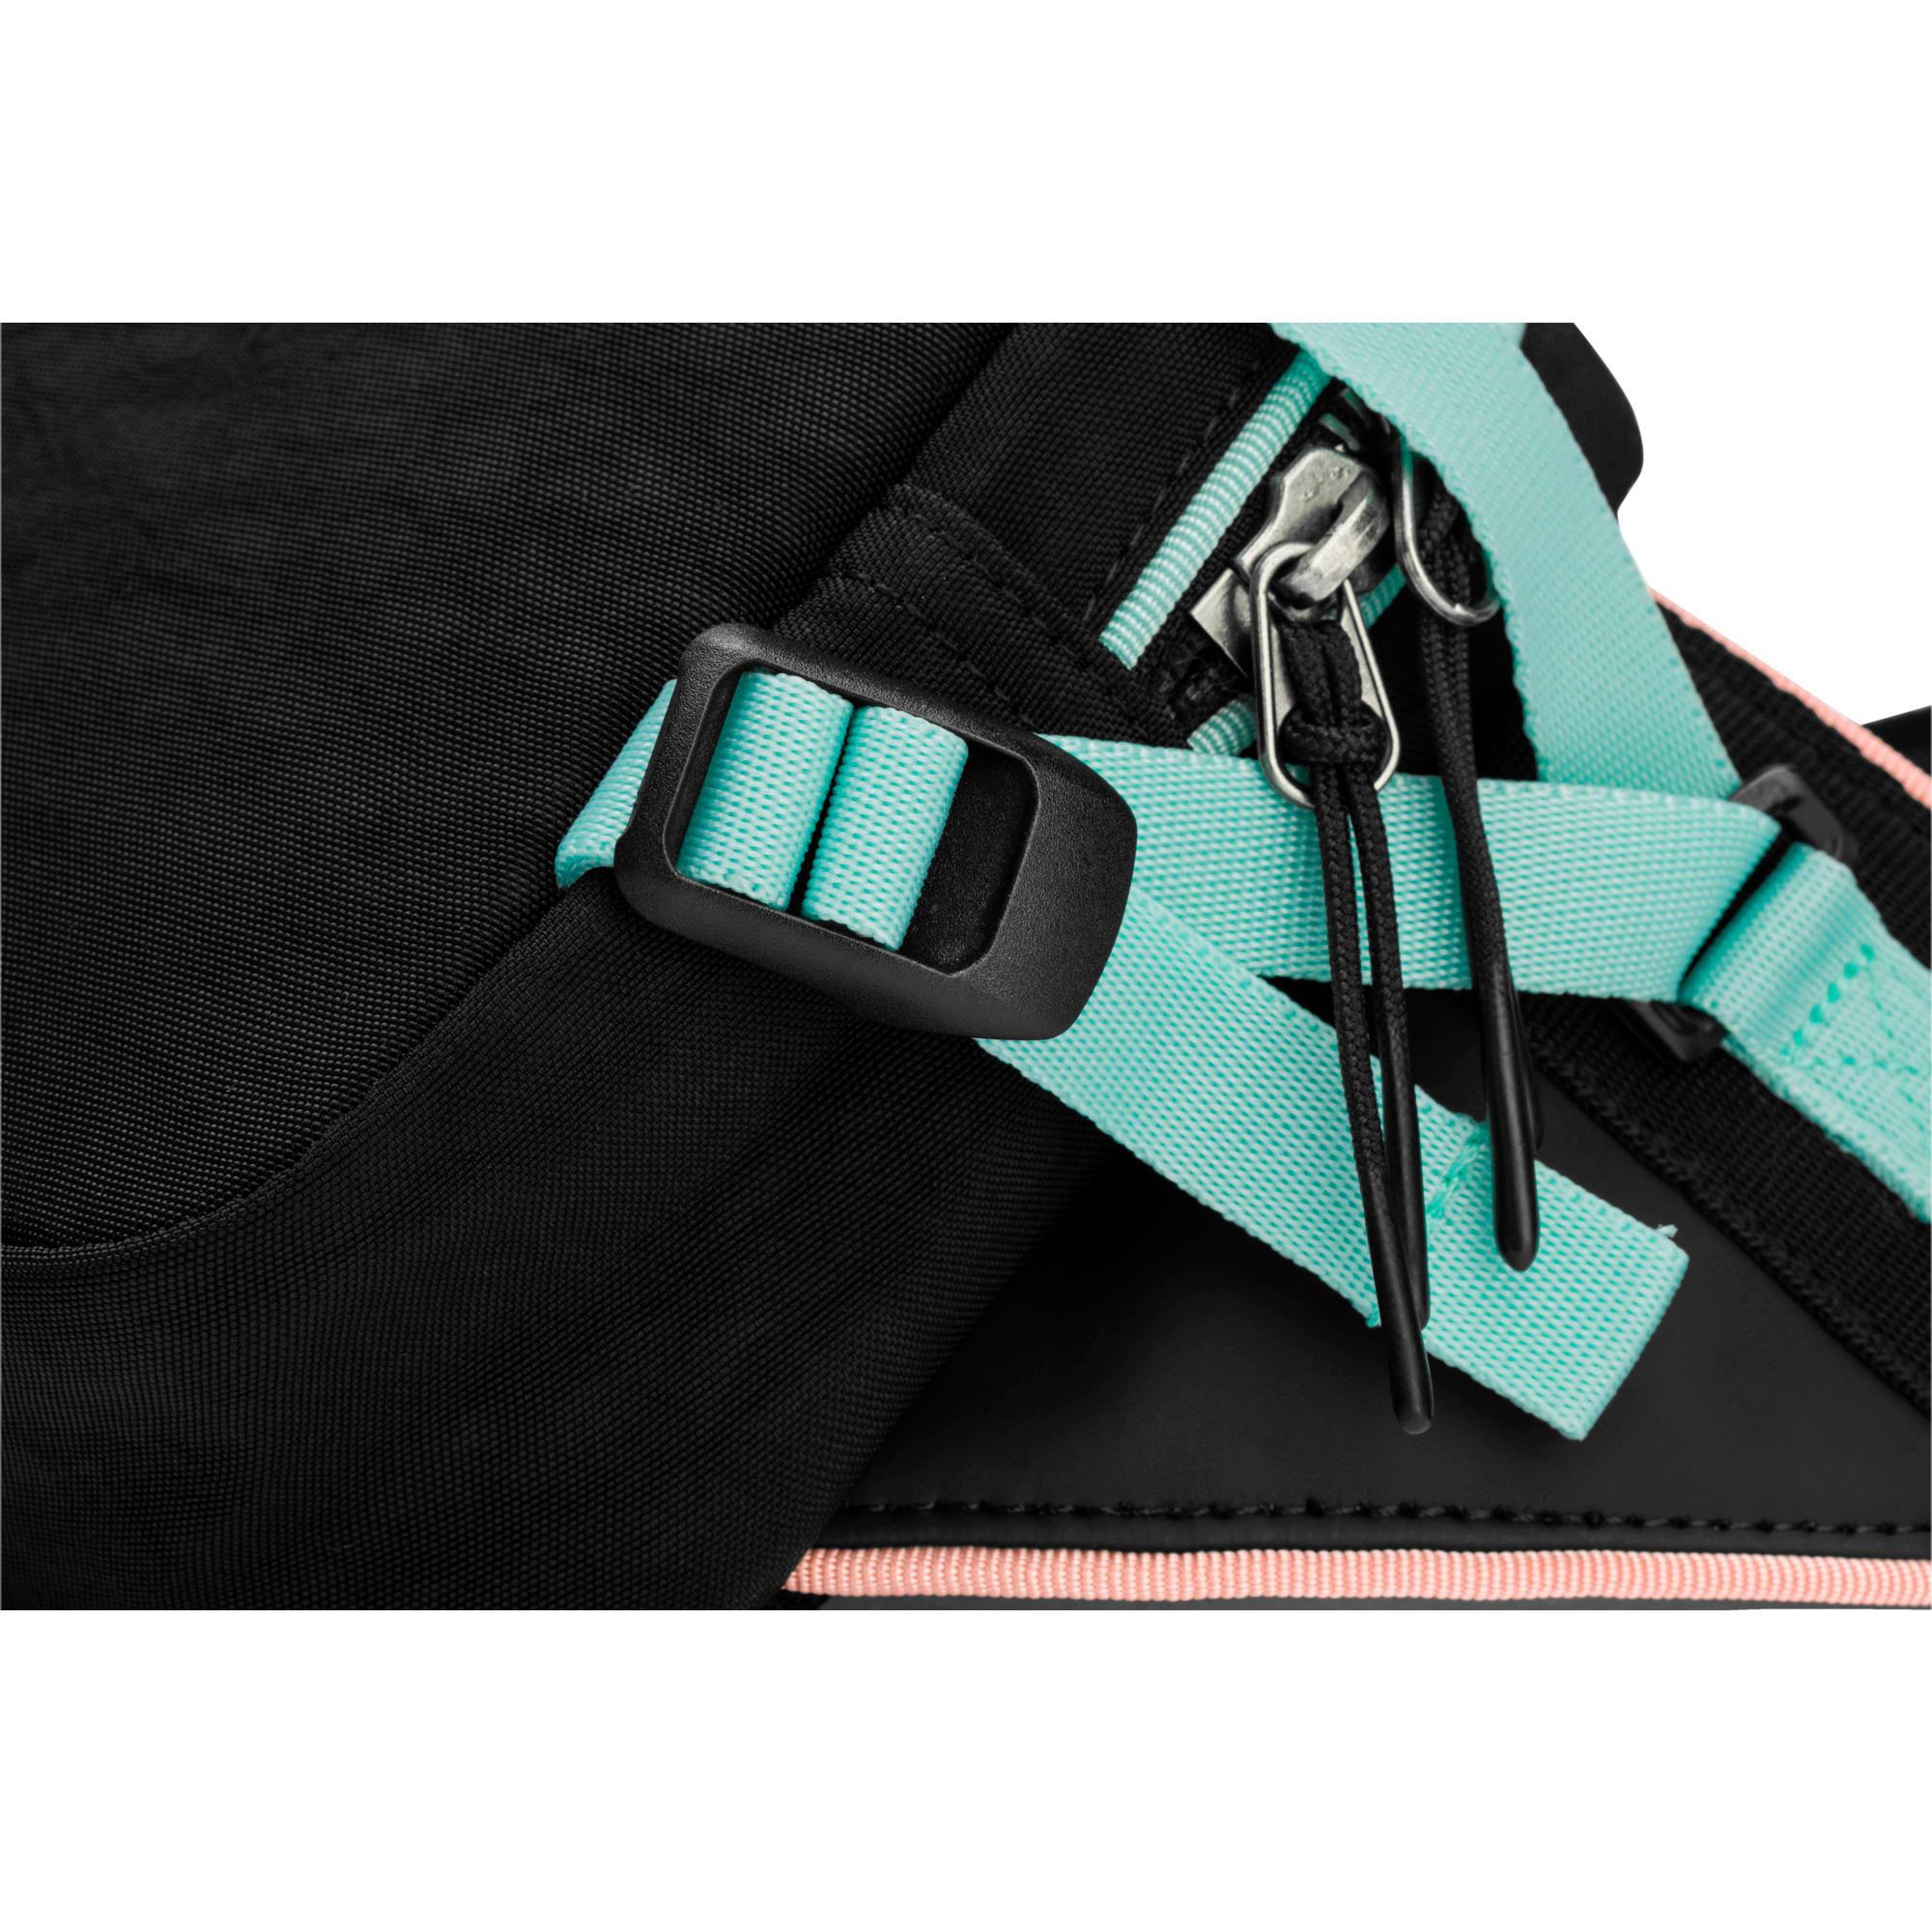 Thumbnail 5 of PUMA x DIAMOND Crossbody Bag, Diamond Blue-AOP, medium